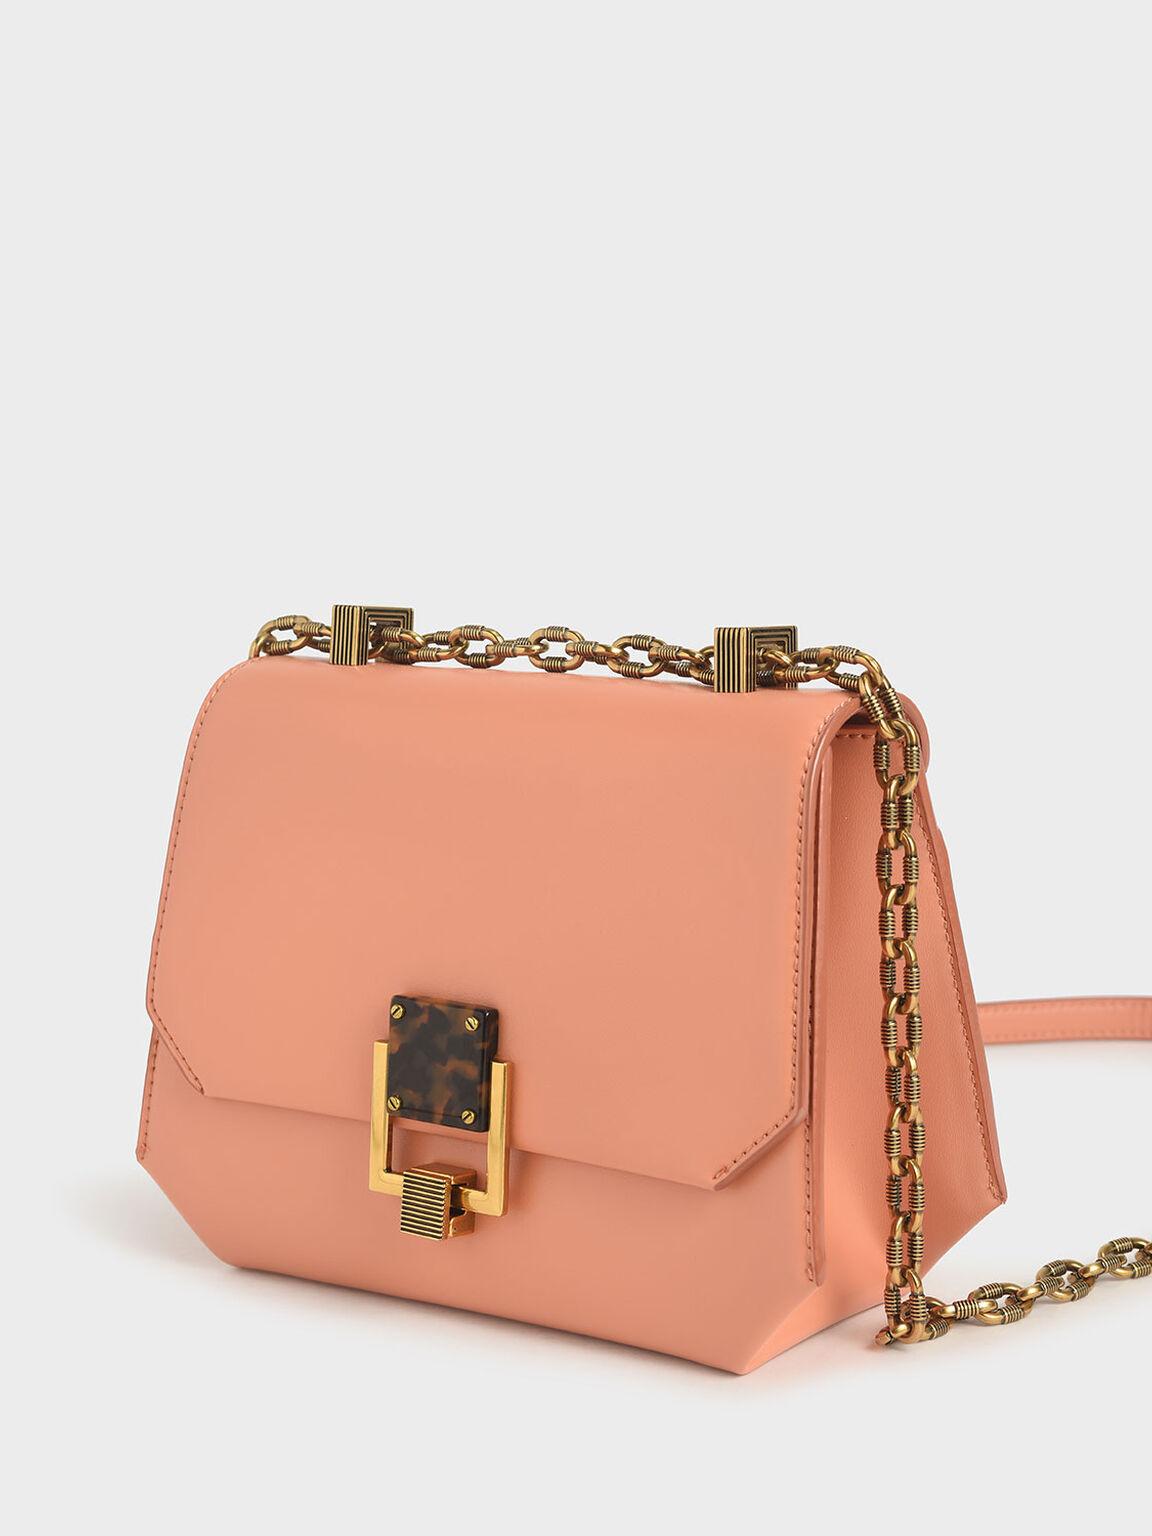 Chain Handle Geometric Crossbody Bag, Peach, hi-res